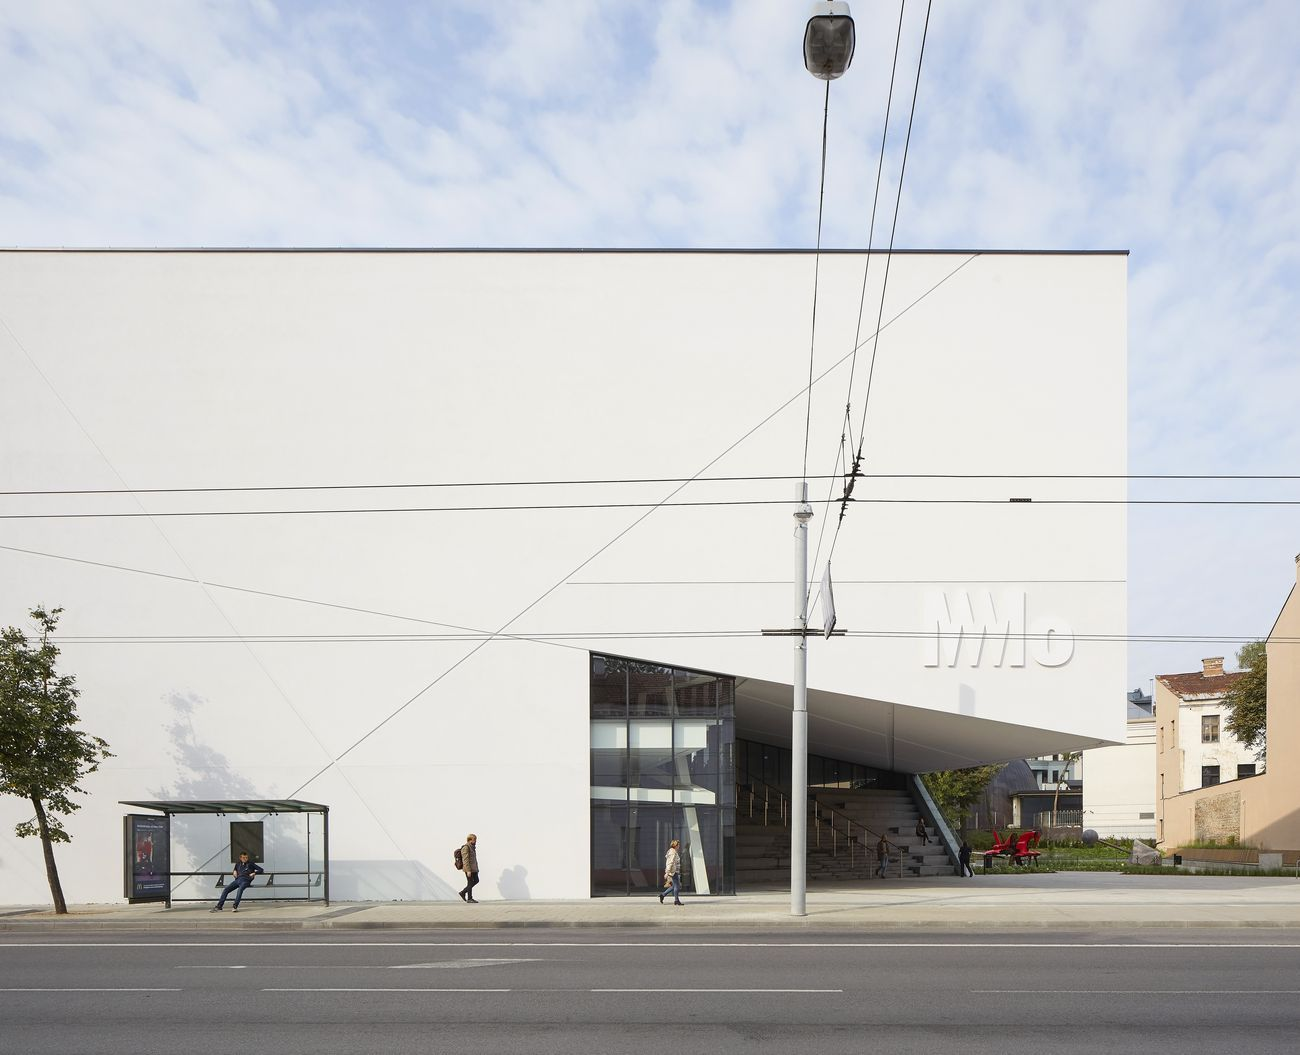 Studio Libeskind, MO Museum, Vilnius © Hufton+Crow